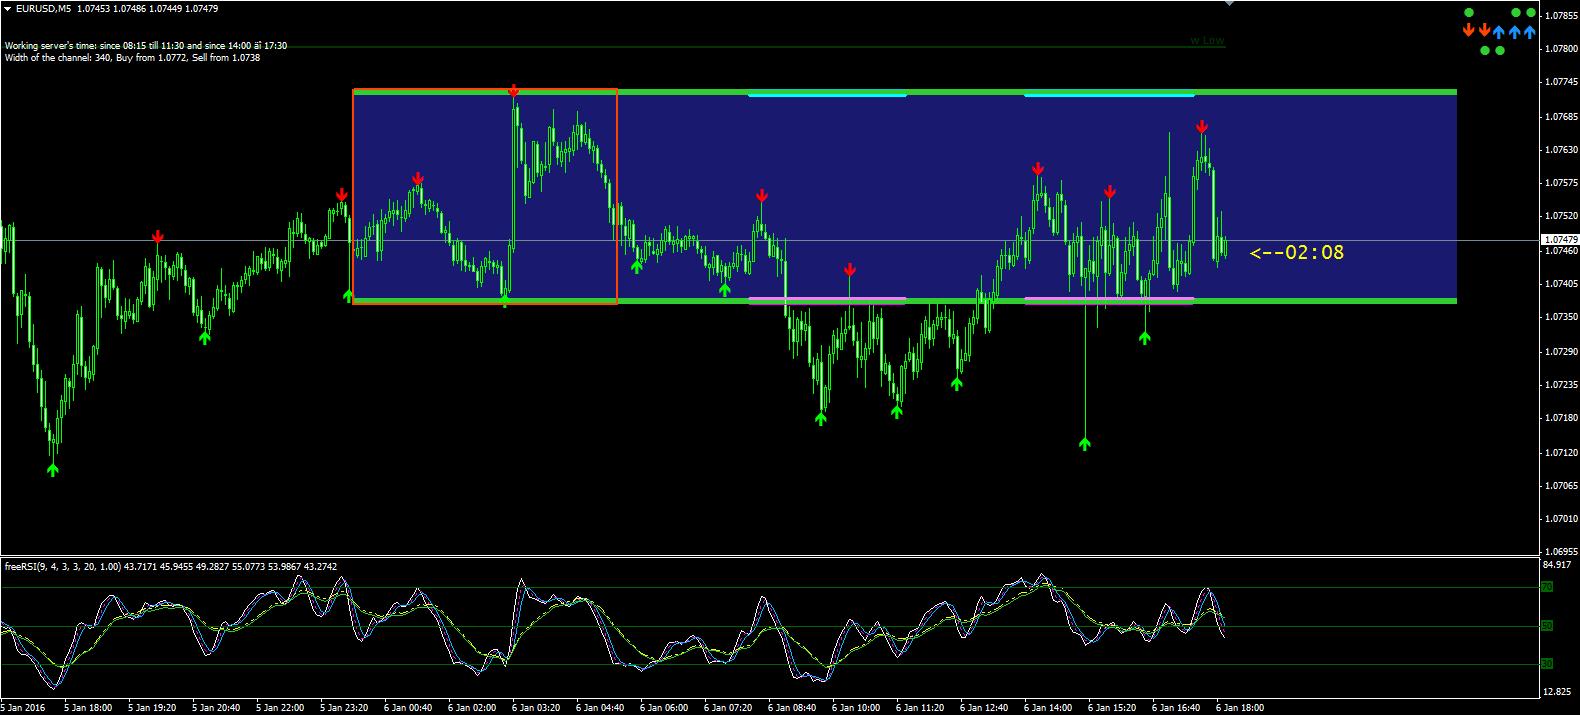 Risk free binary options tradinglevel 24